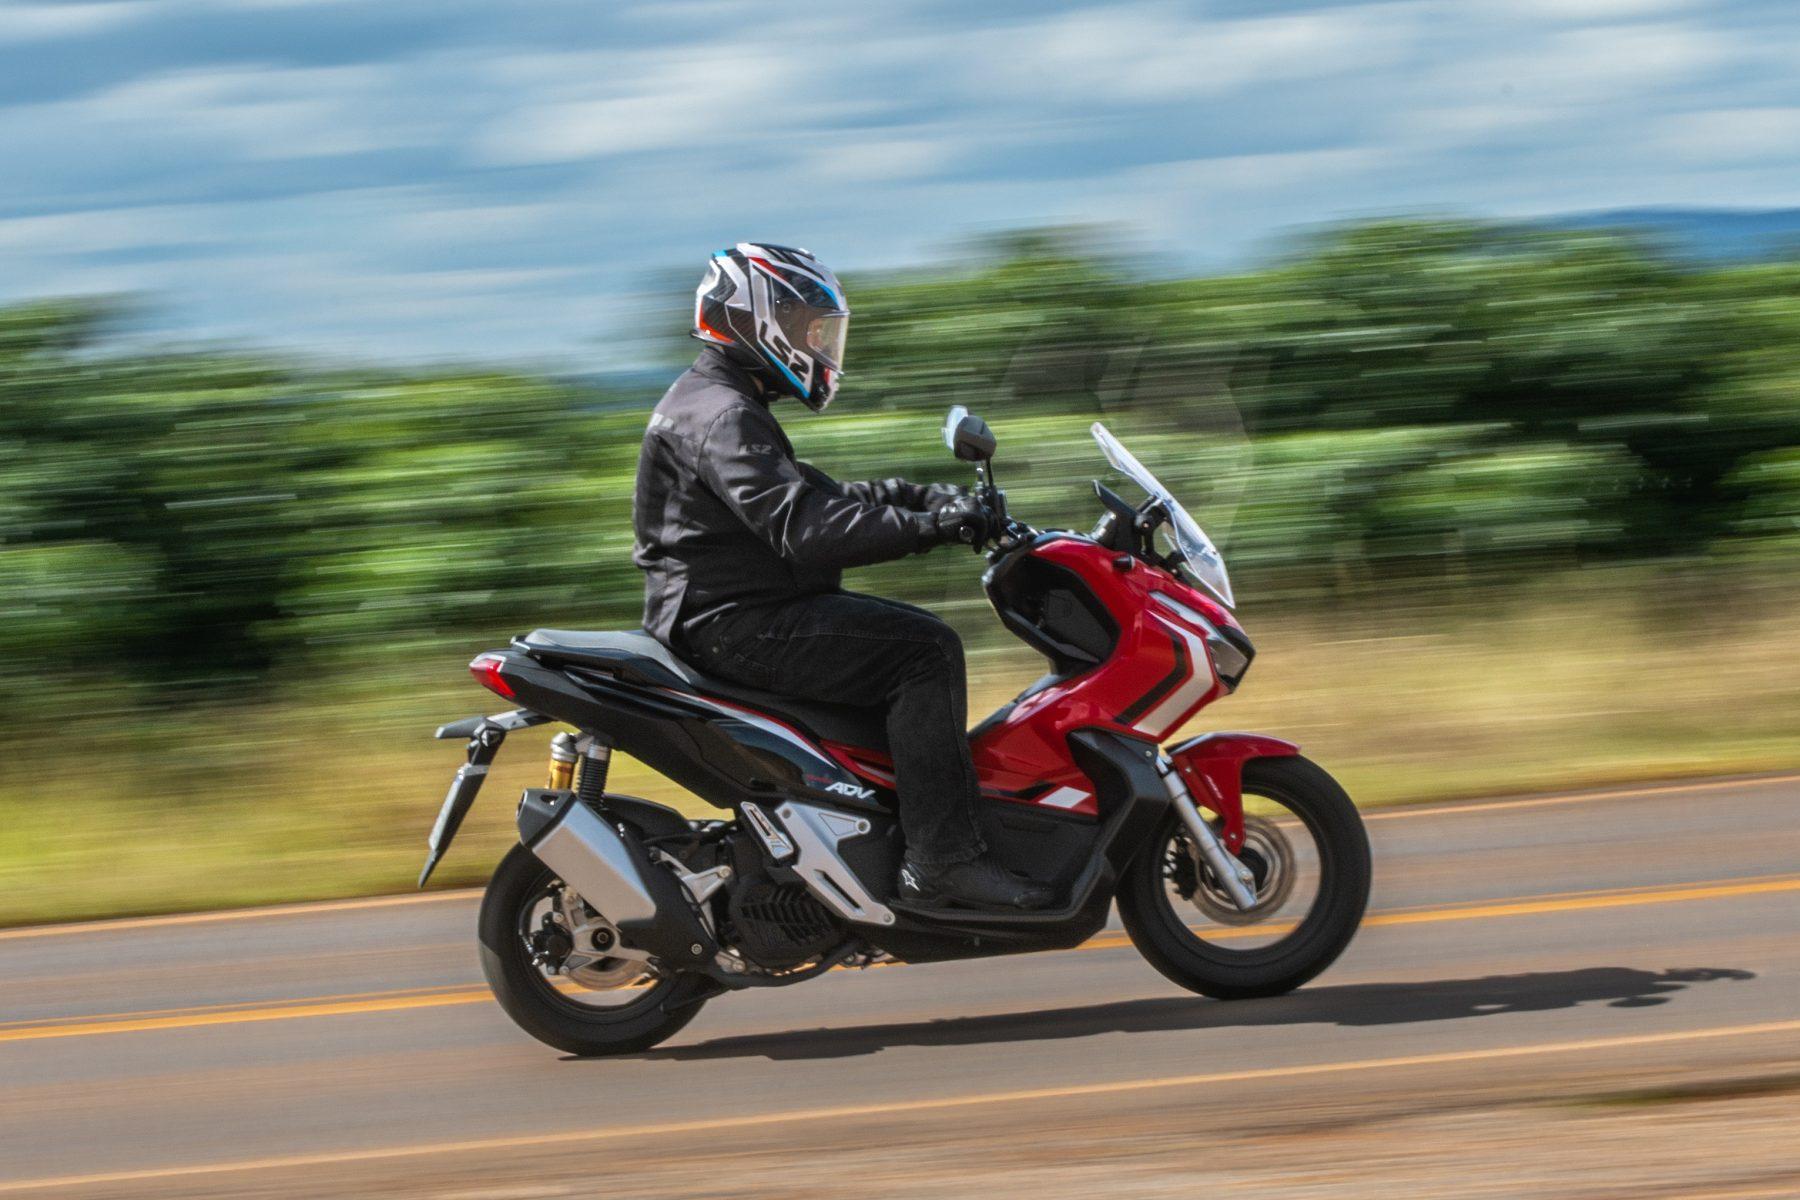 scooter honda adv 150 impressoes 11